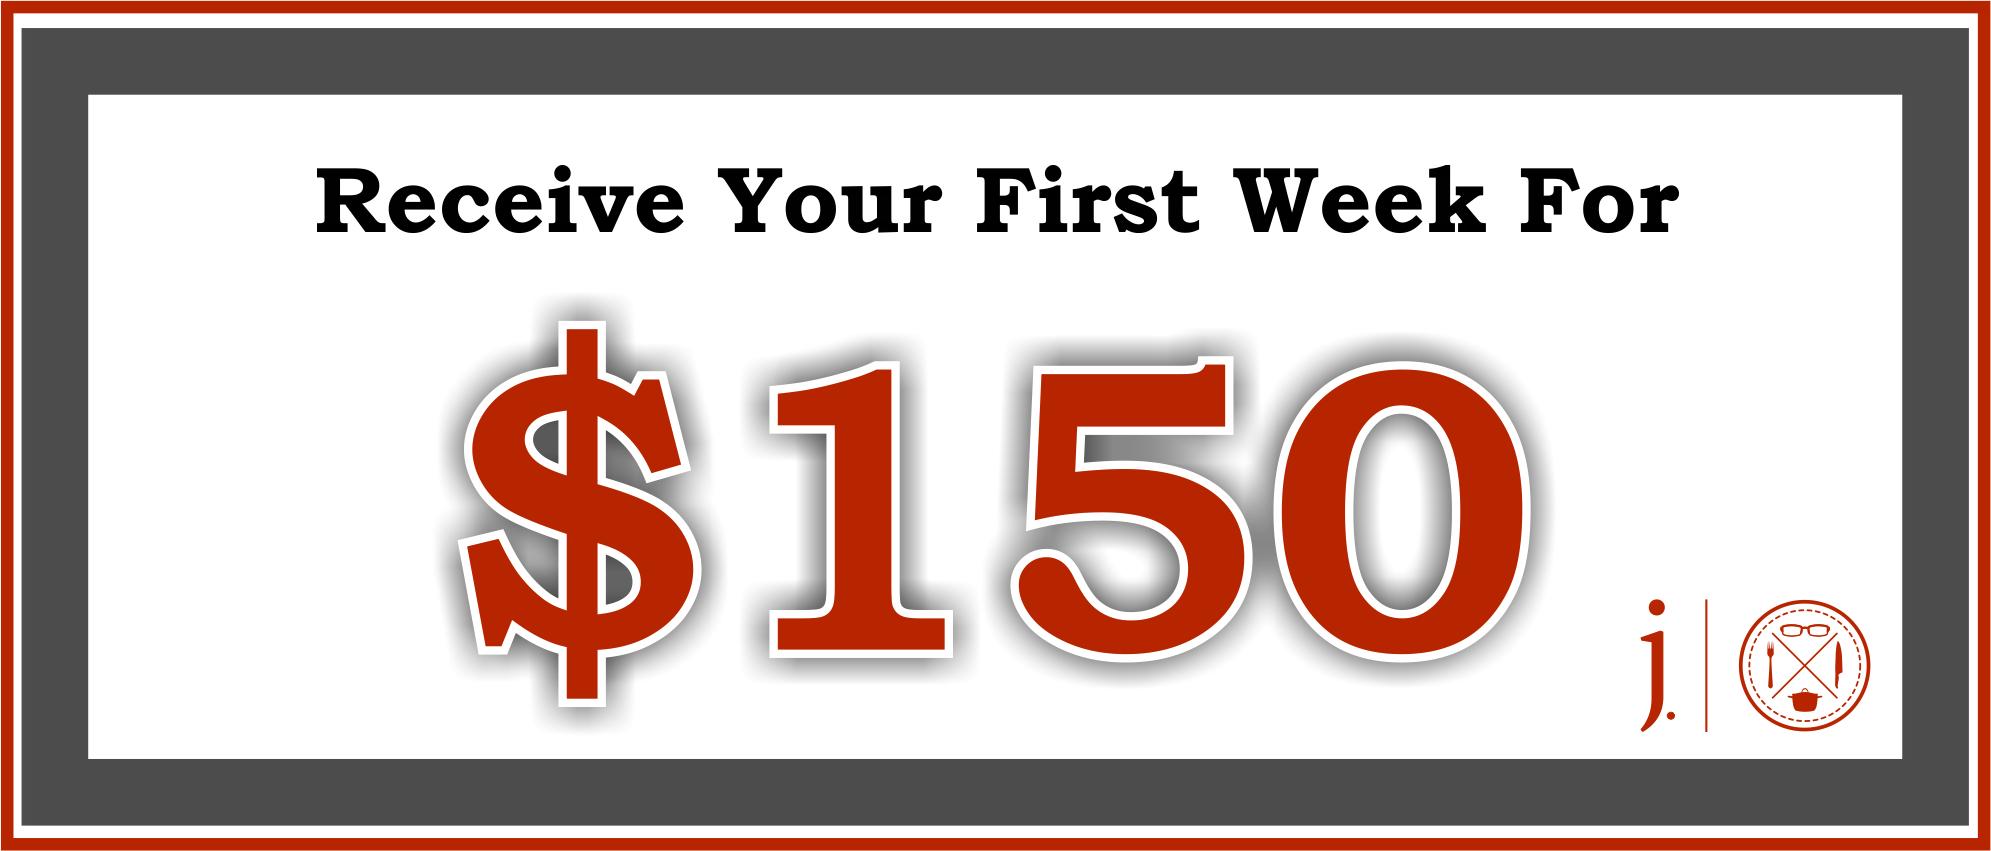 first week $150.jpg